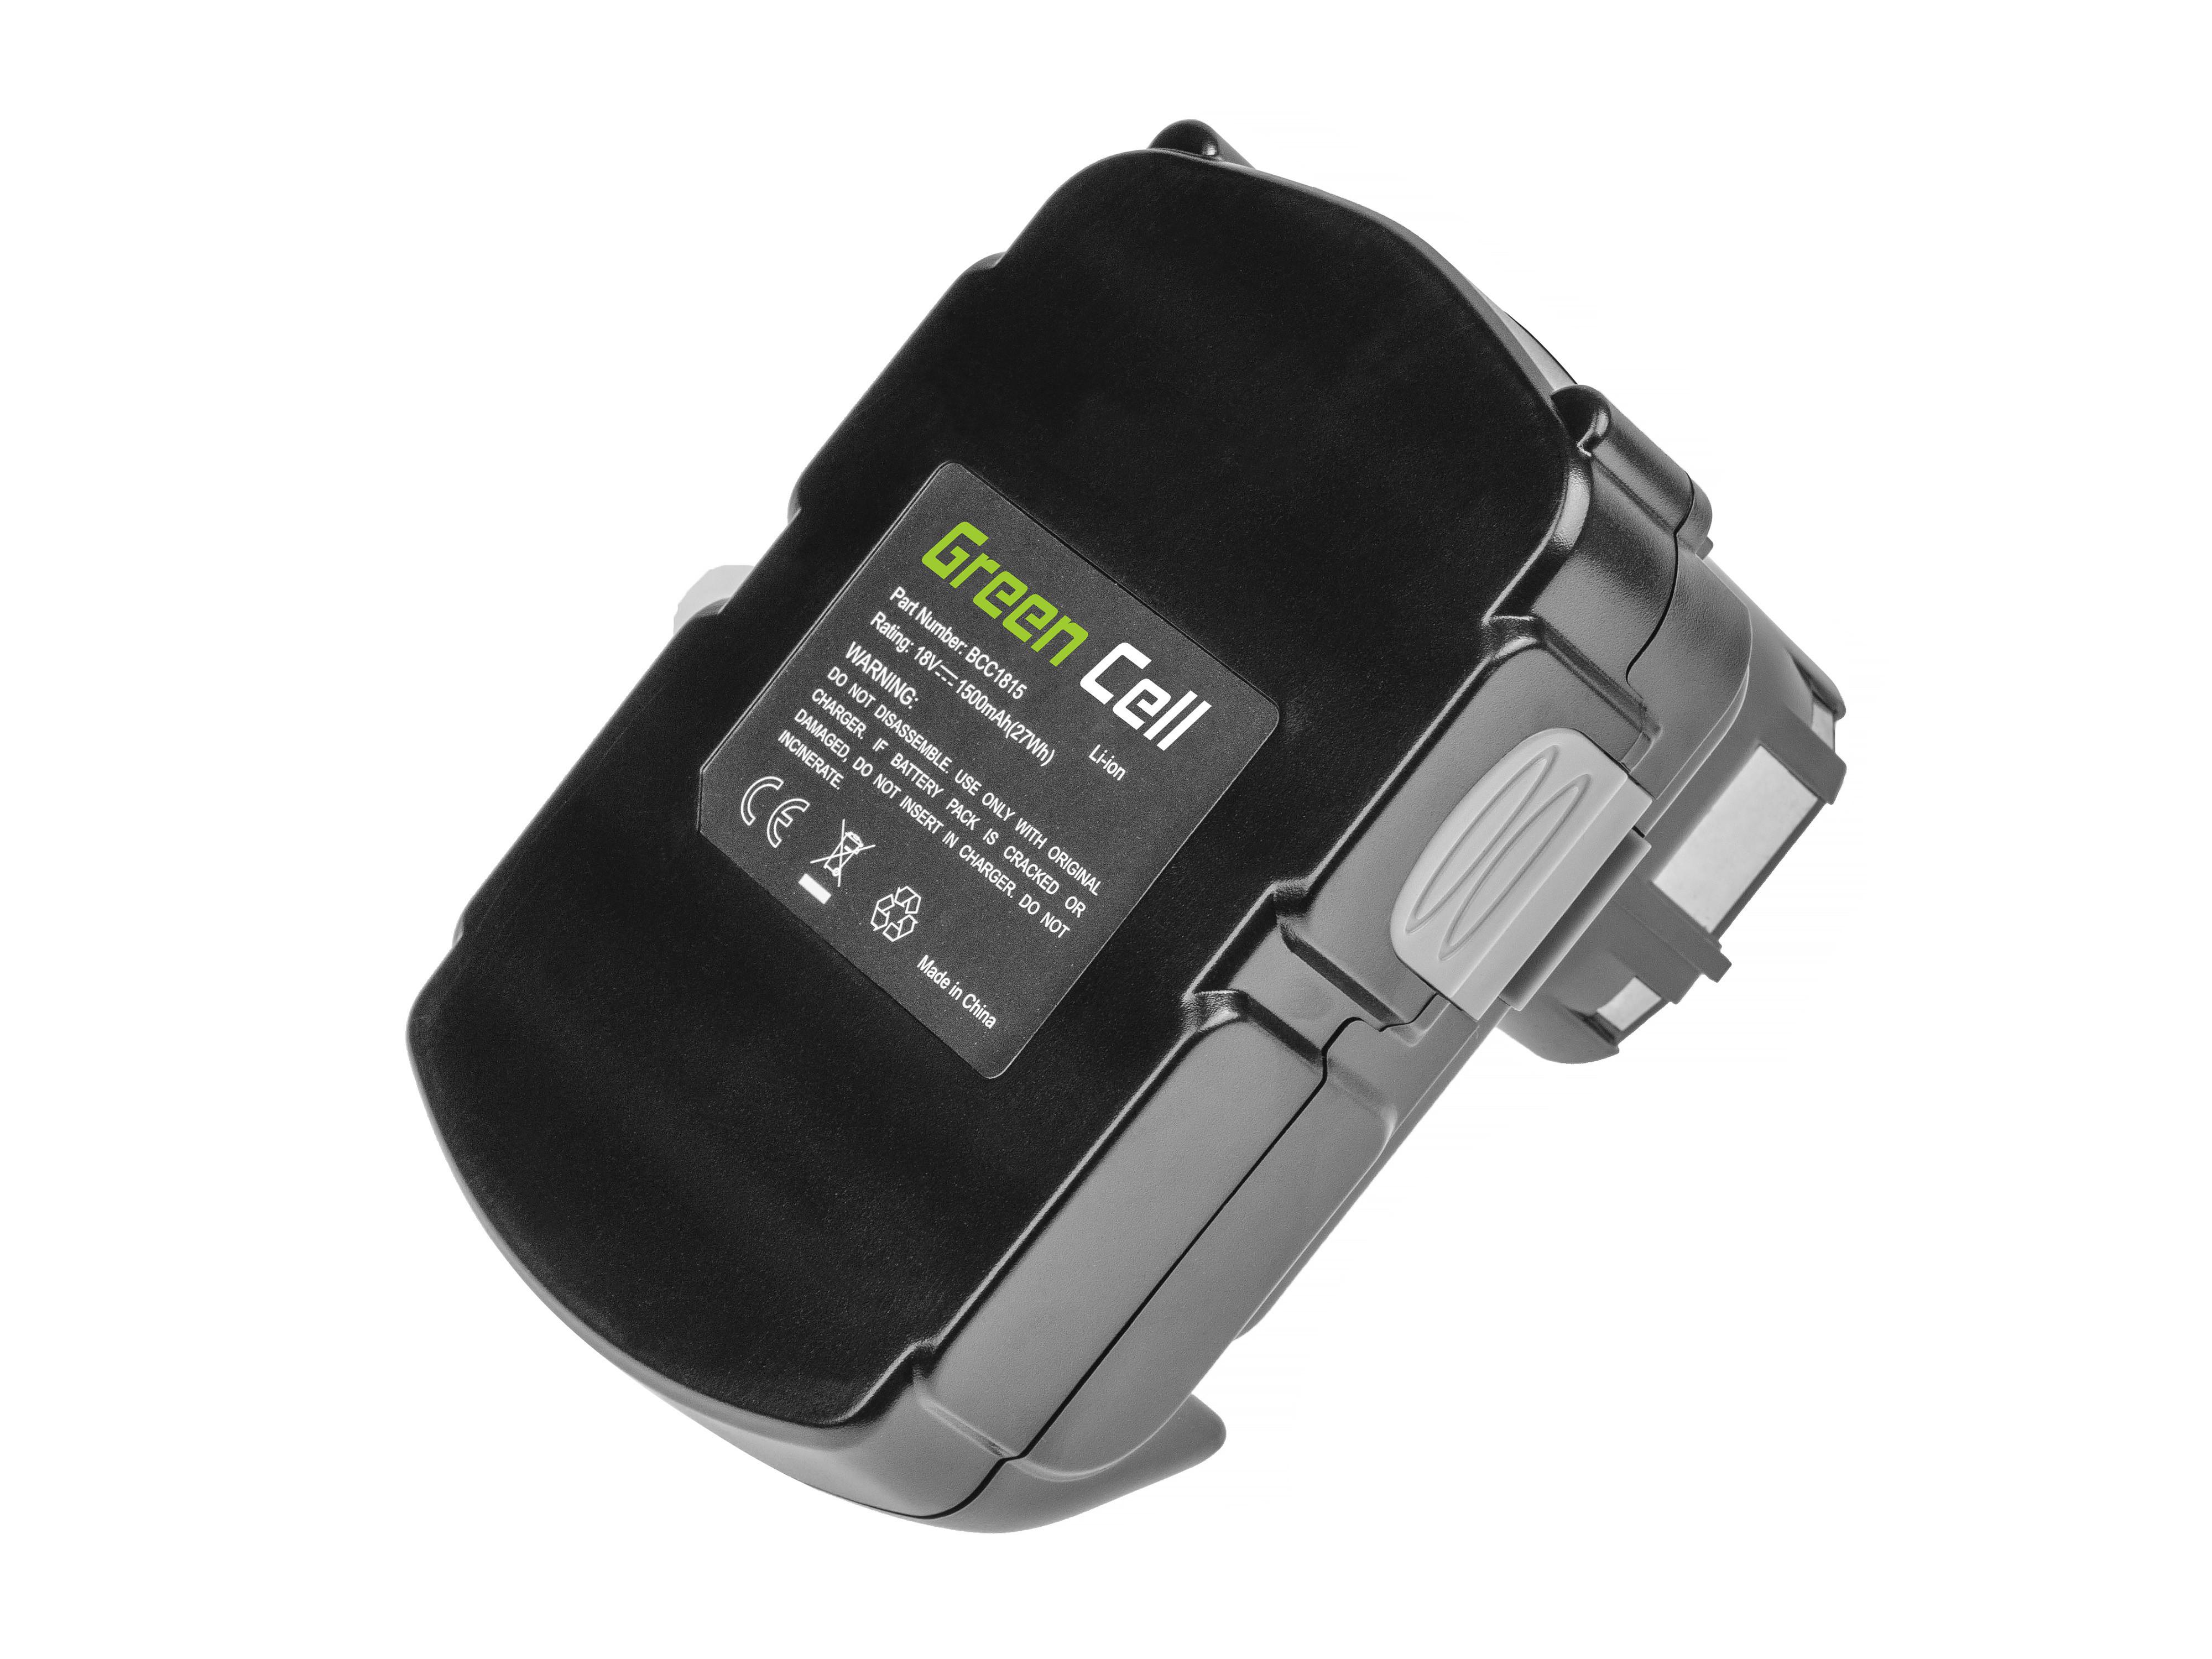 Baterie Green Cell Hitachi BCL1815 C18DL 18V 1500mAh Li-ion - neoriginální